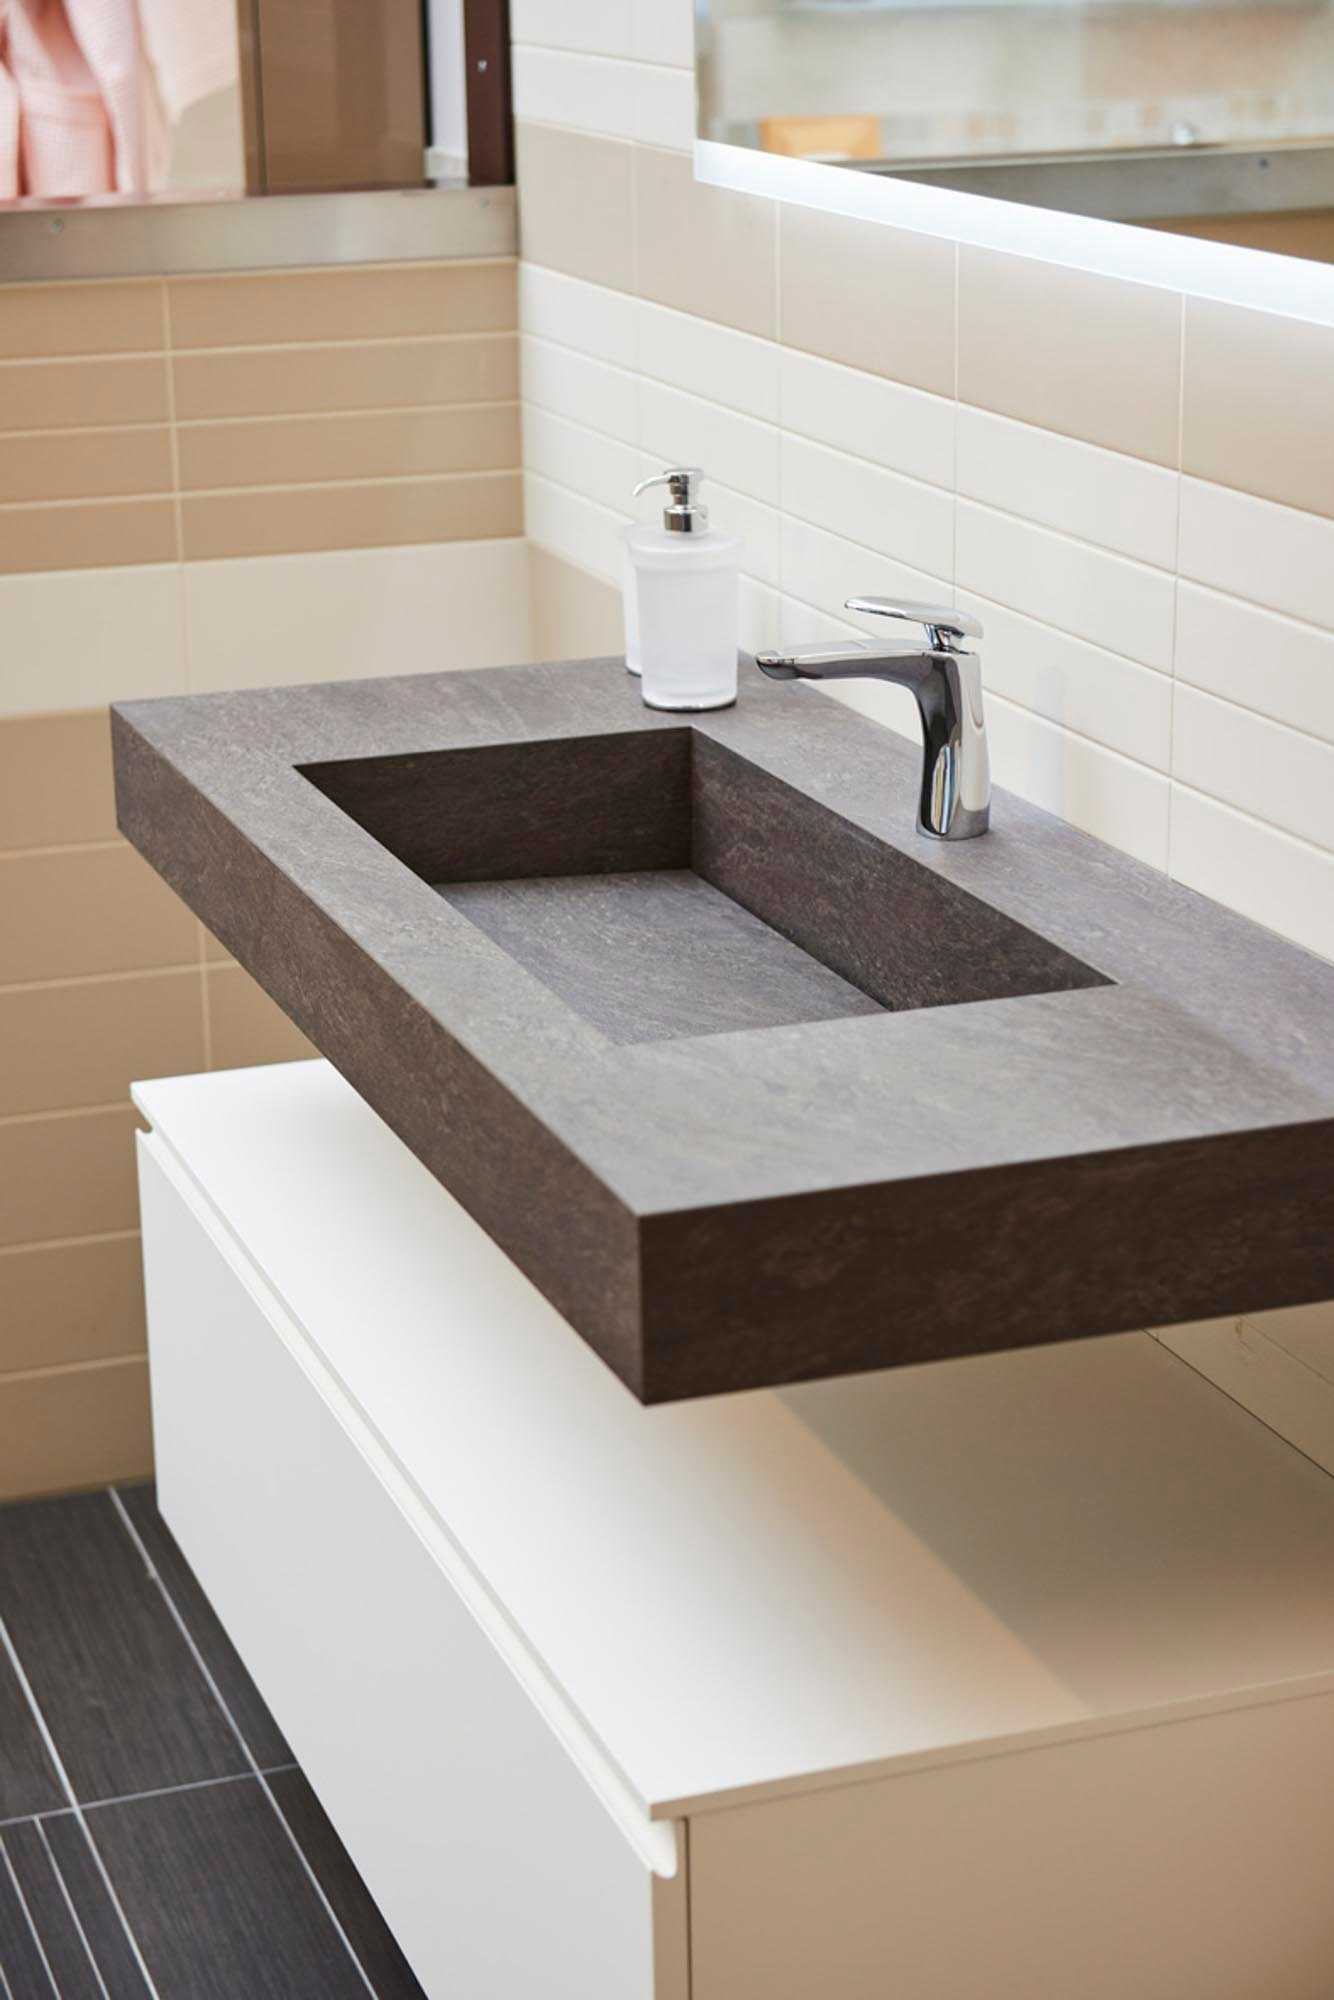 Showroom SVAI_Colognola_arredobagno moderno lavabo incassato